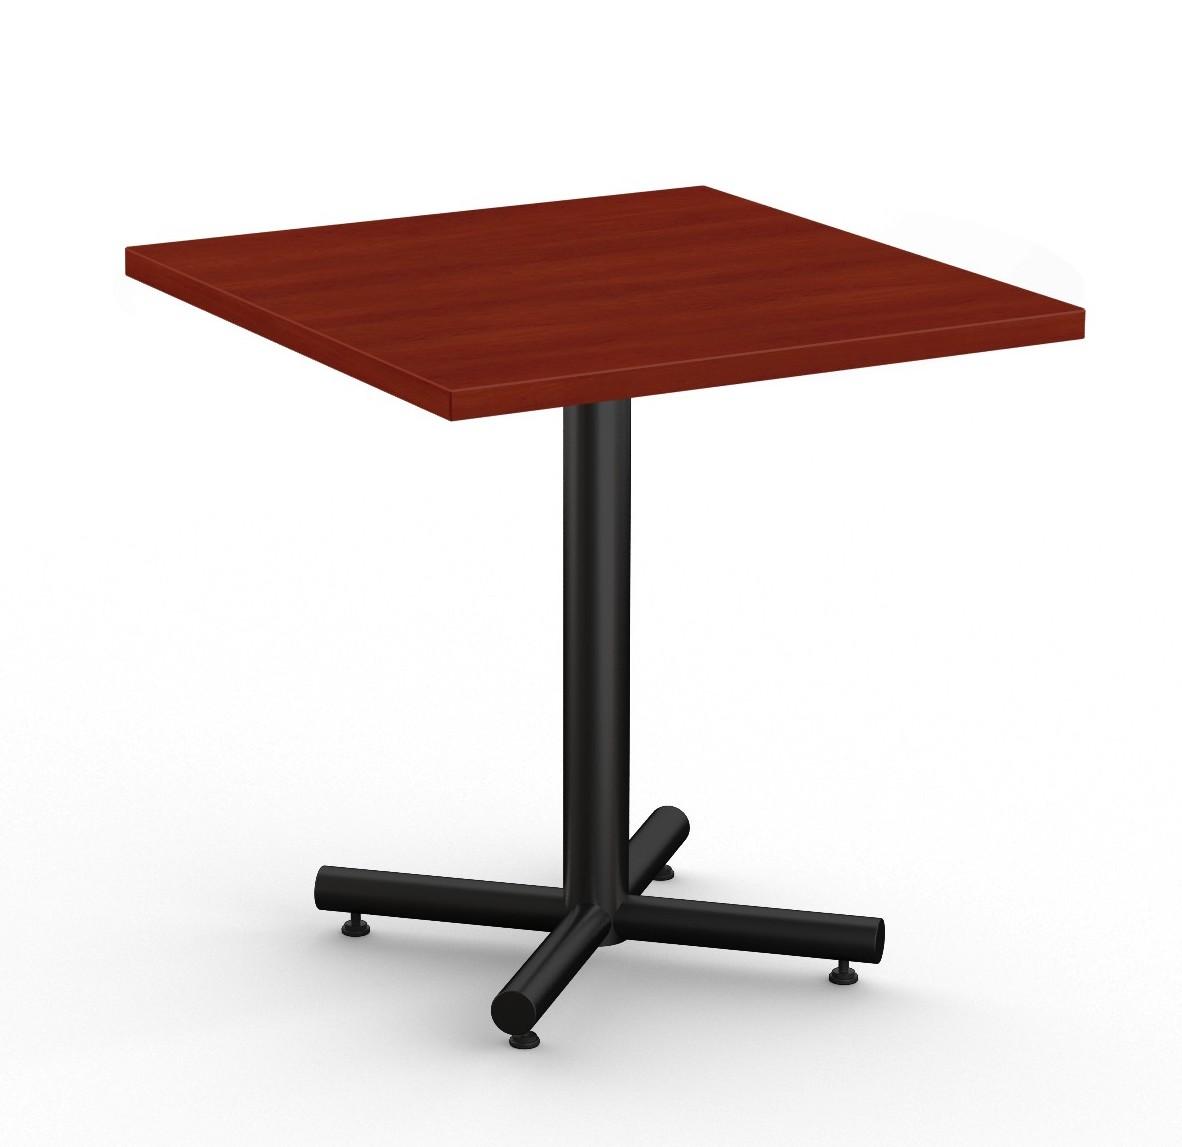 "classix 36"" square table in cherry"